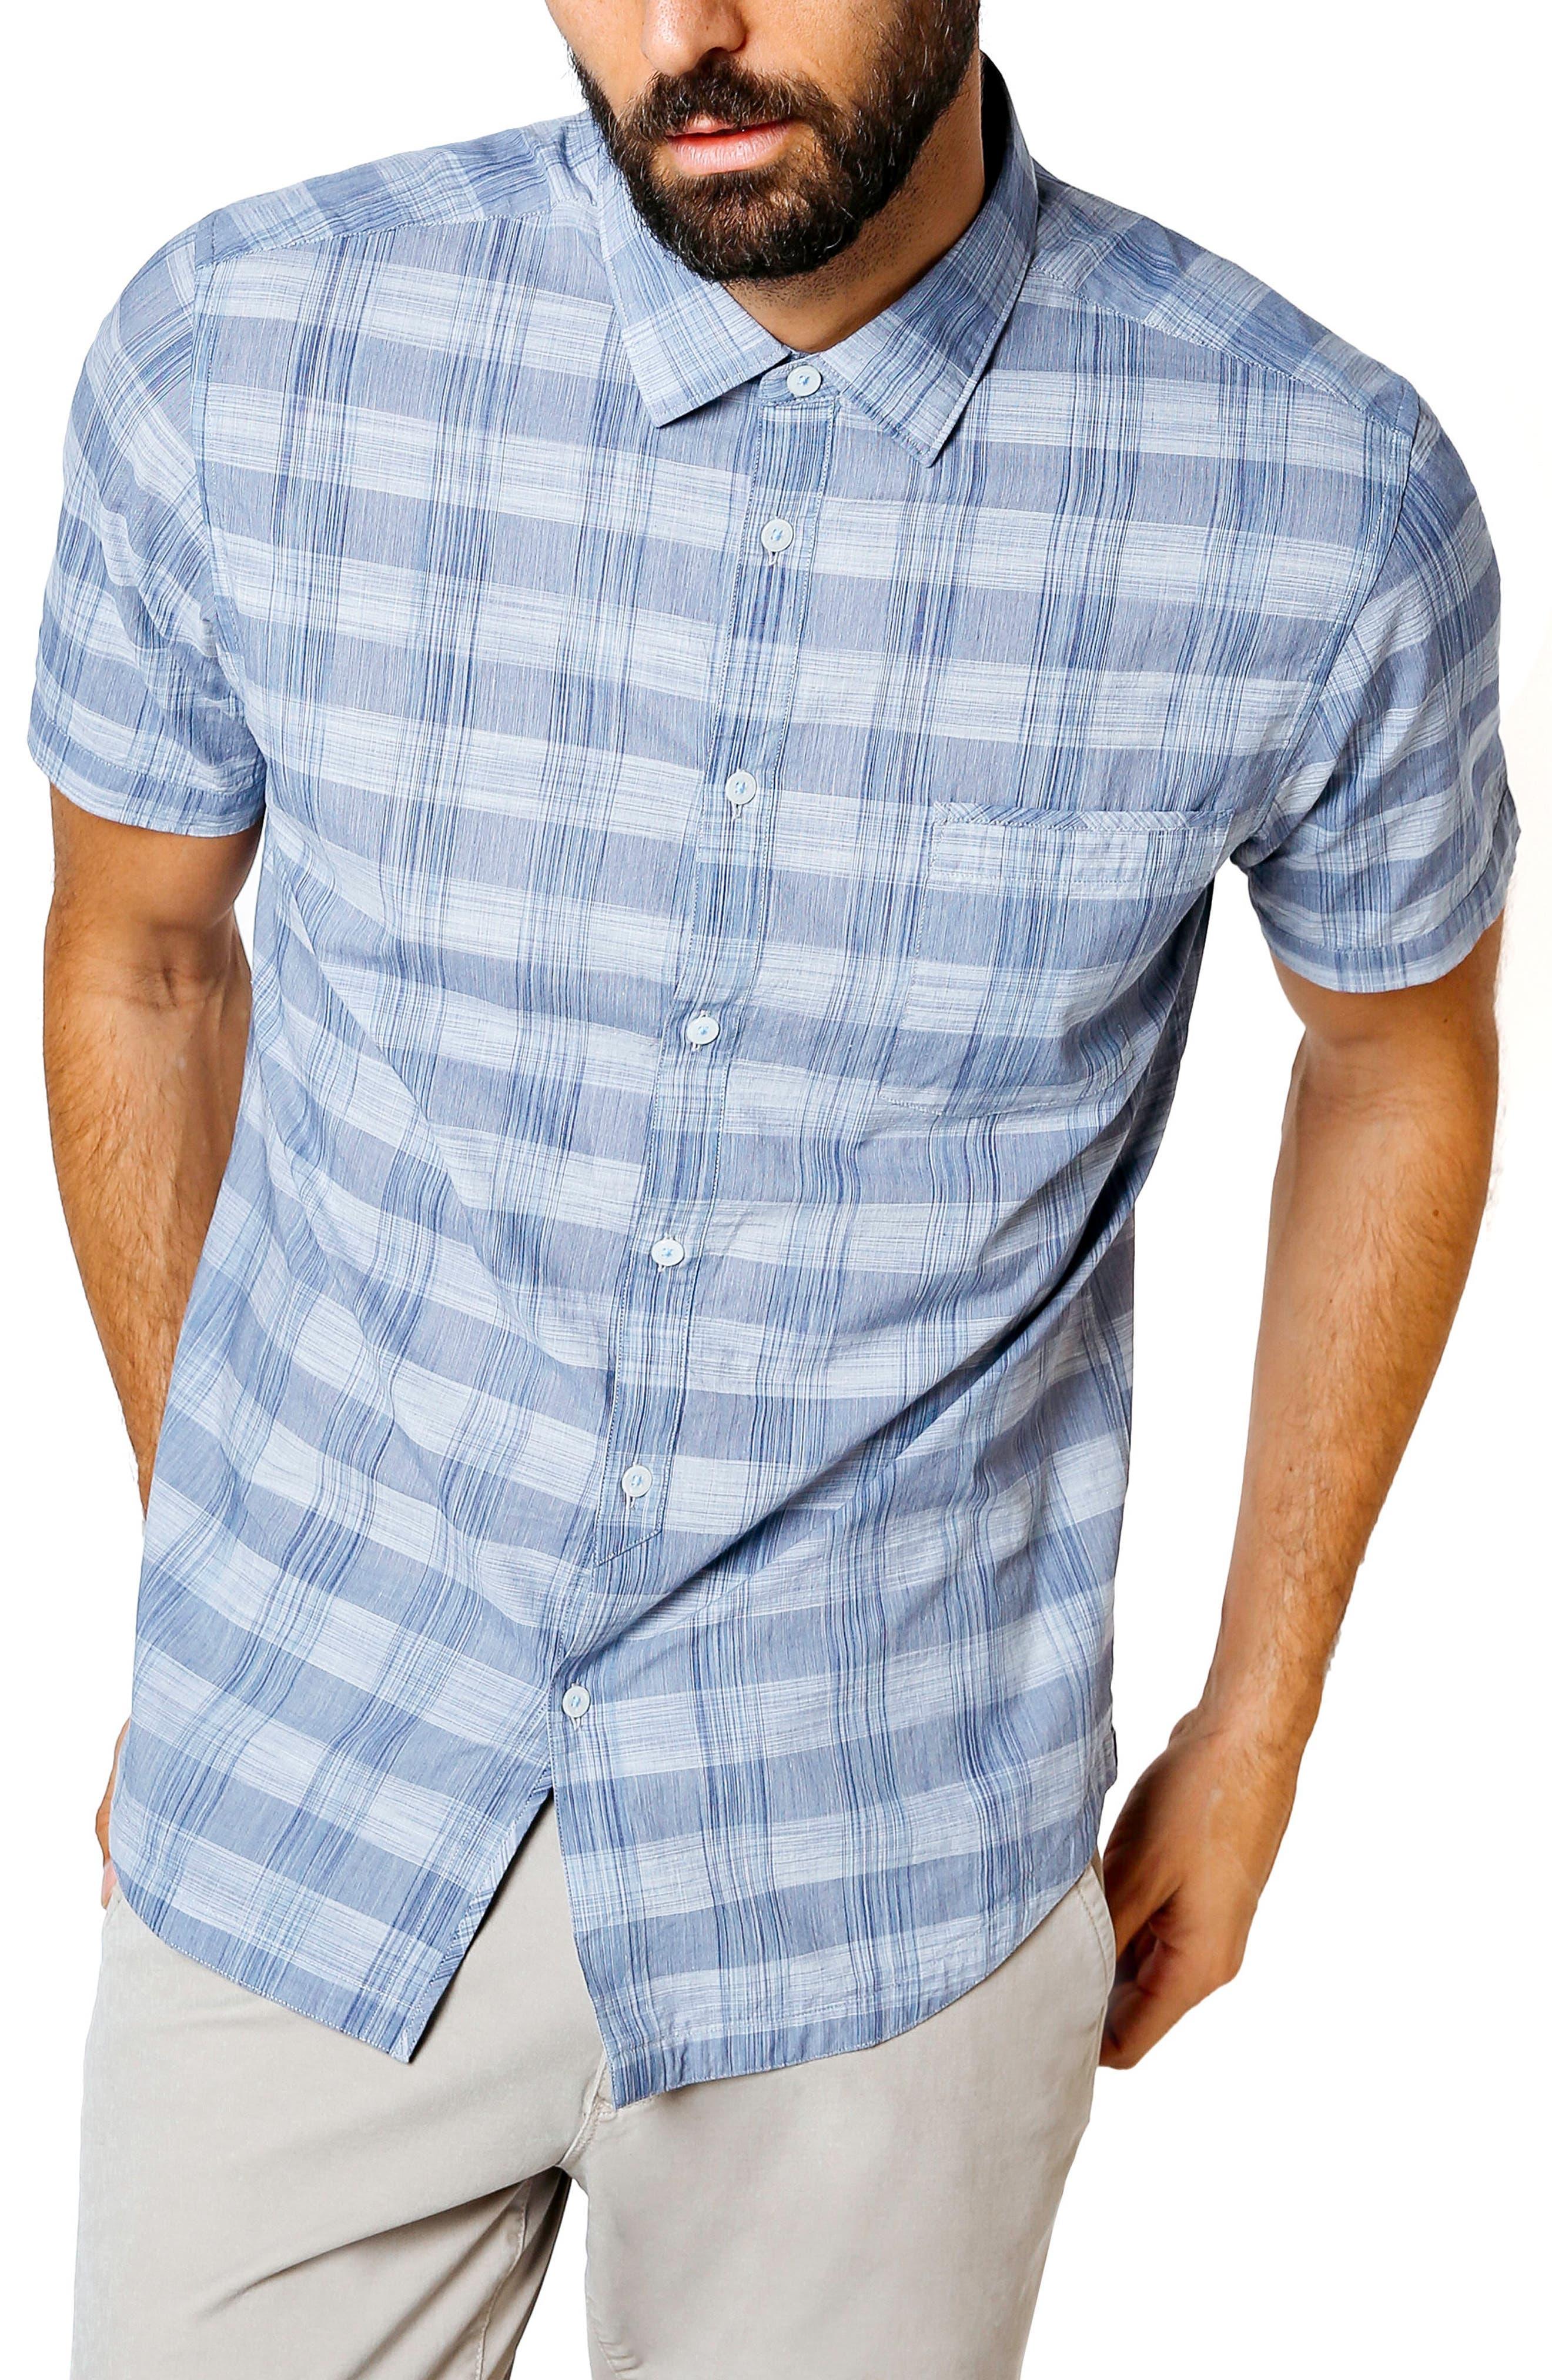 GOOD MAN BRAND Palisade Space Trim Fit Check Sport Shirt, Main, color, 410